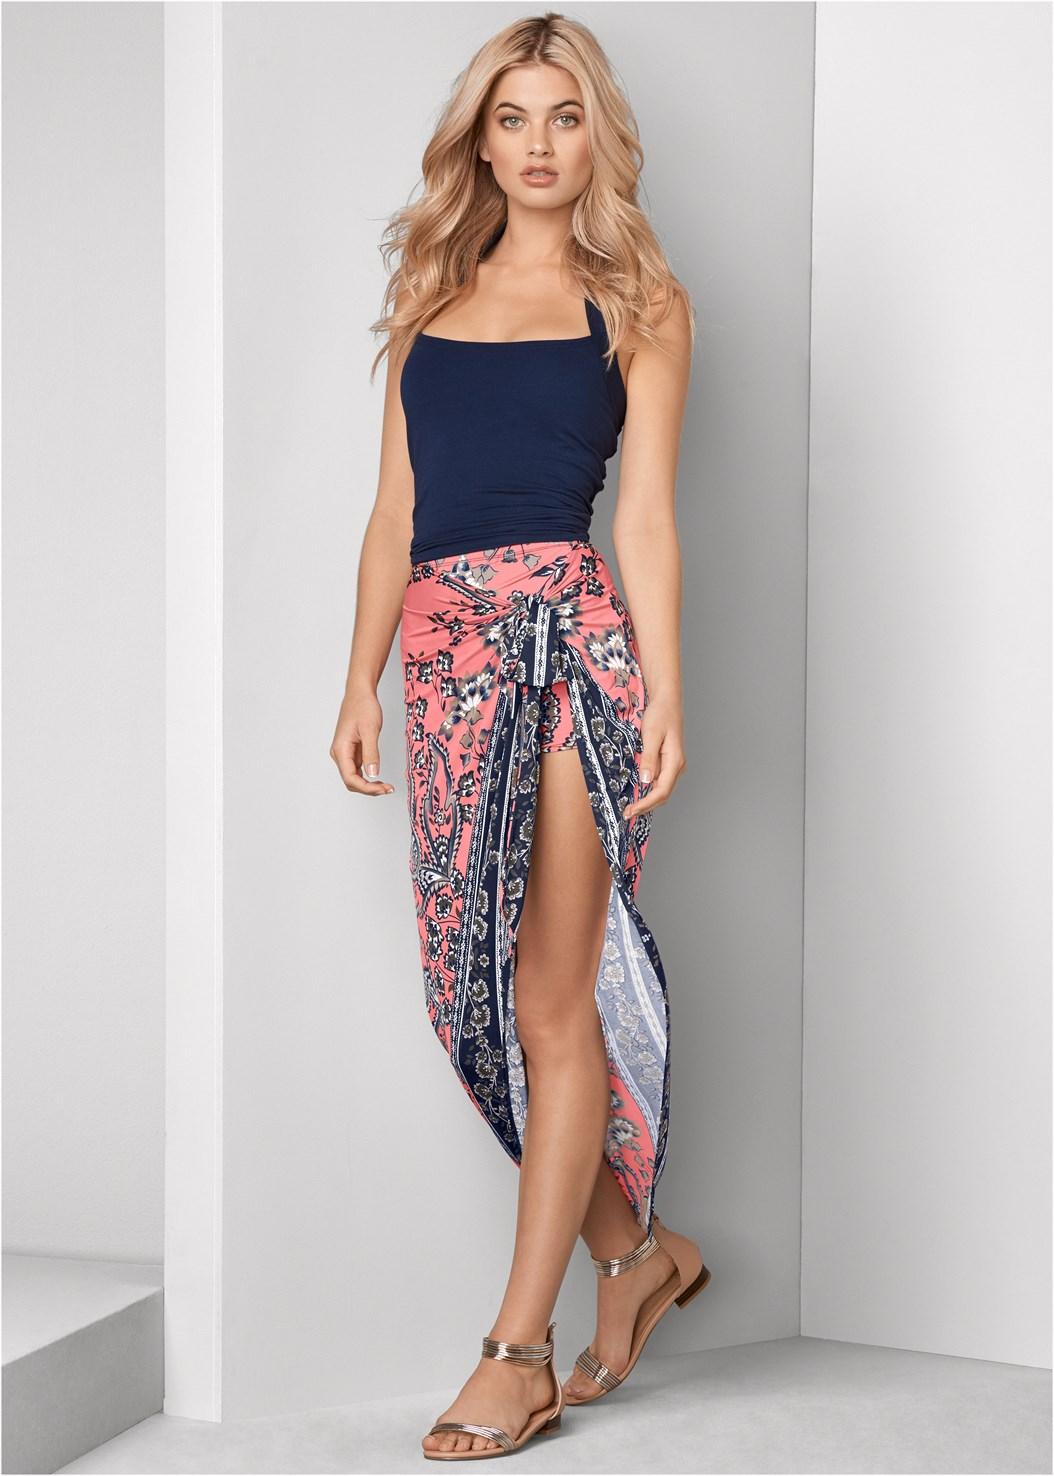 Print Wrap Skirt,Easy Halter Top,Metallic Strap Sandals